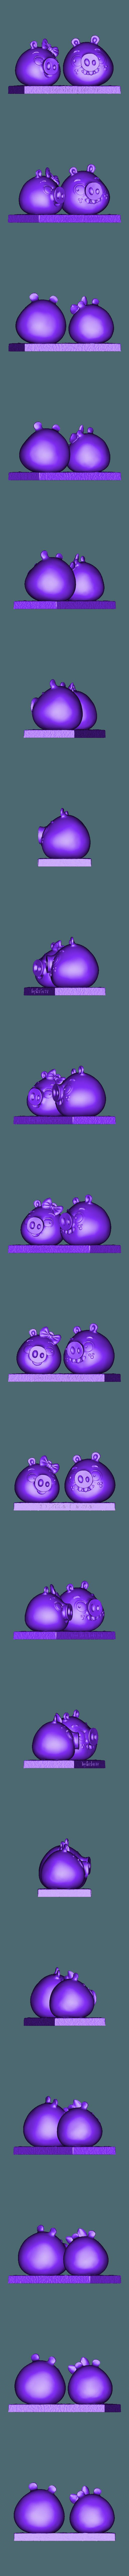 Pig.stl Download free STL file Together Forever • 3D print object, Nikano_Studio